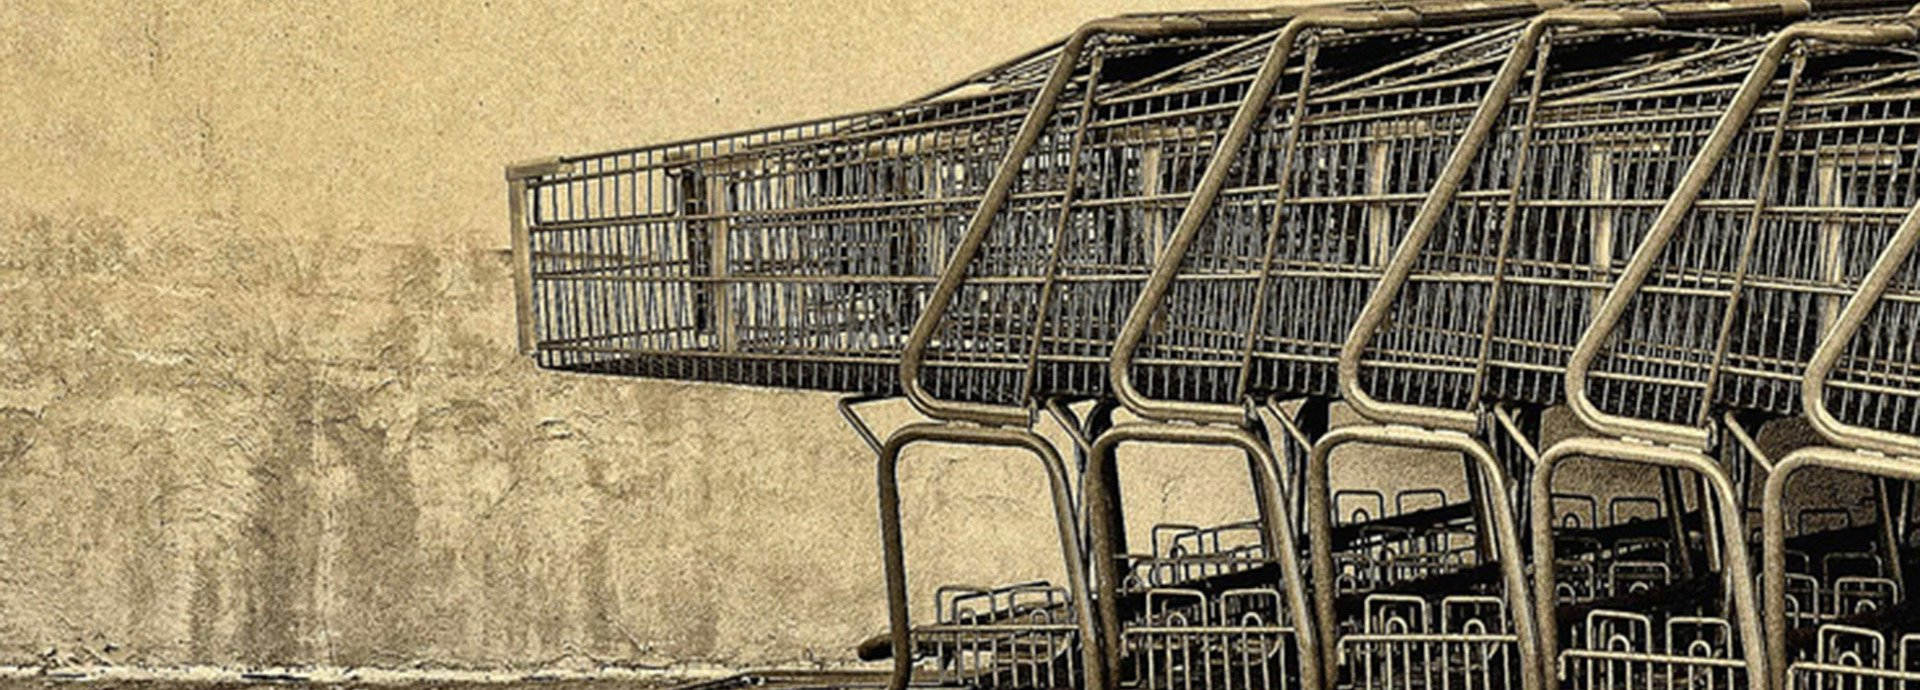 8 beneficios del E-Commerce que todo emprendedor debe conocer